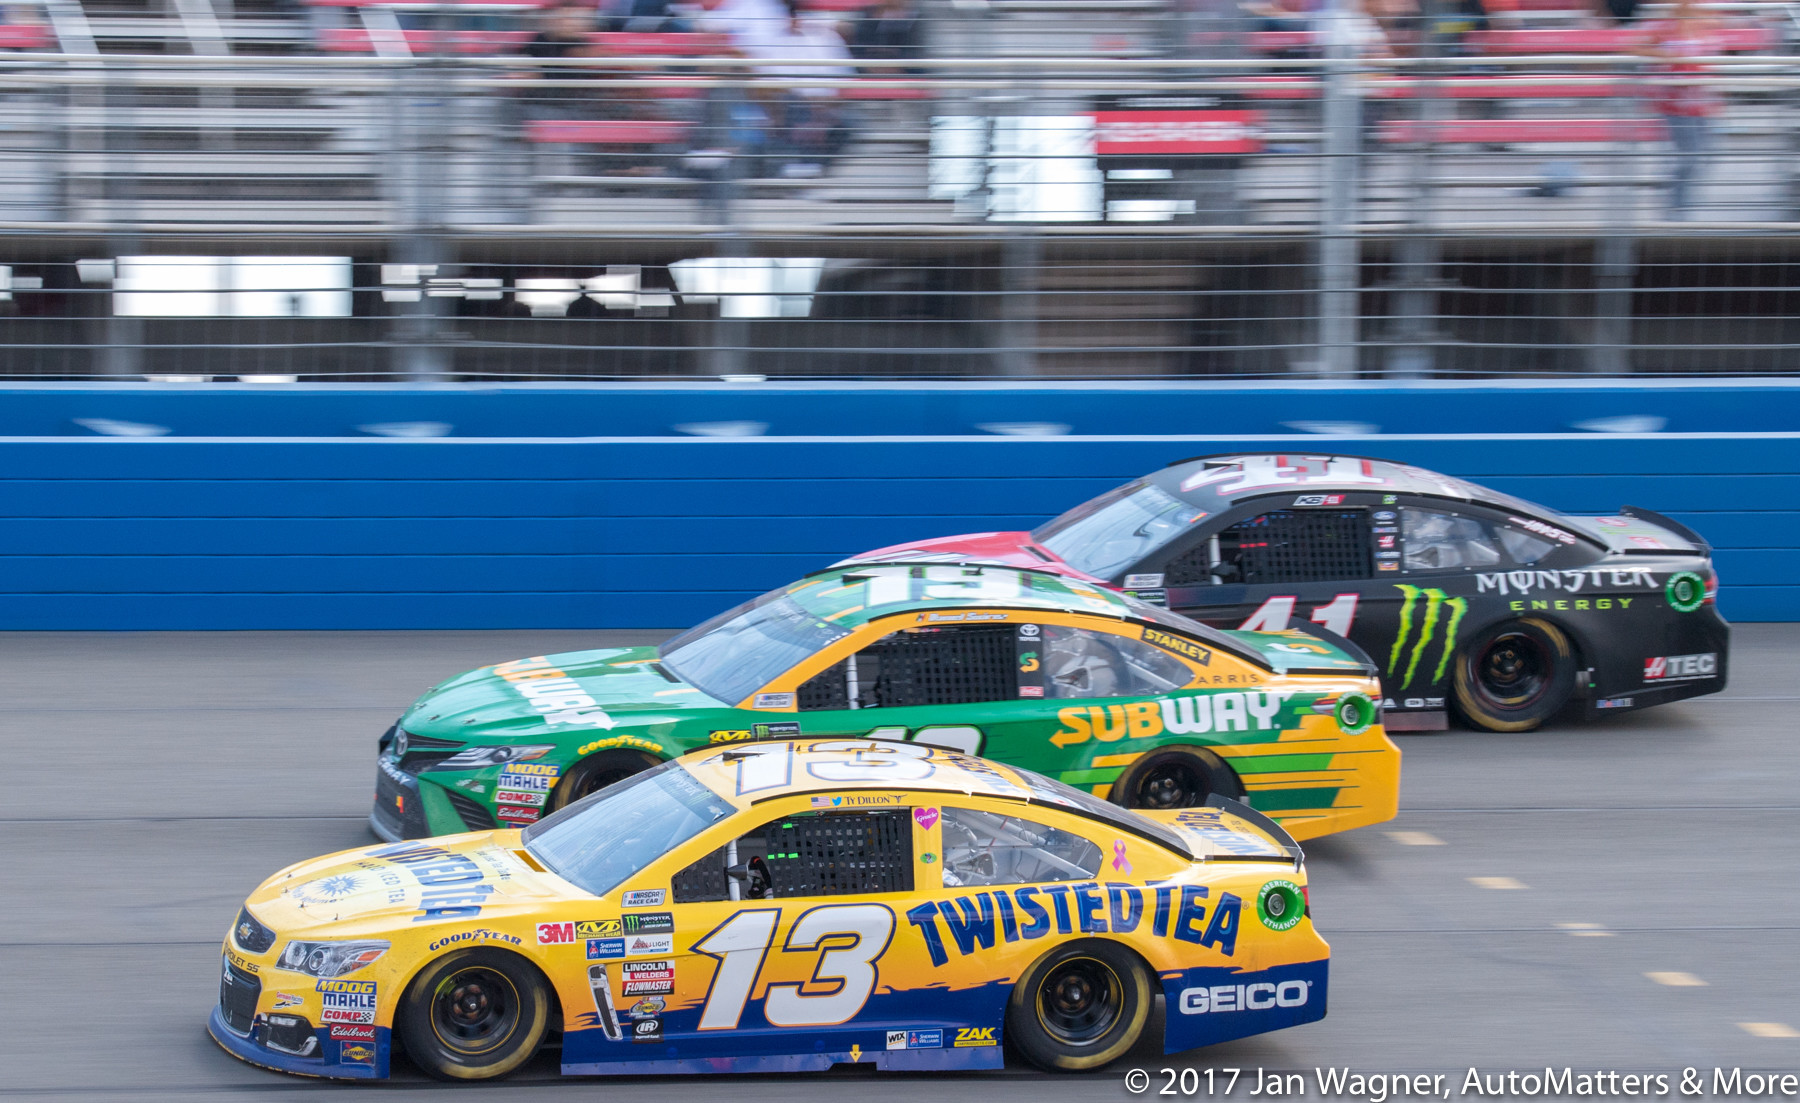 Close Auto Club 400 racing